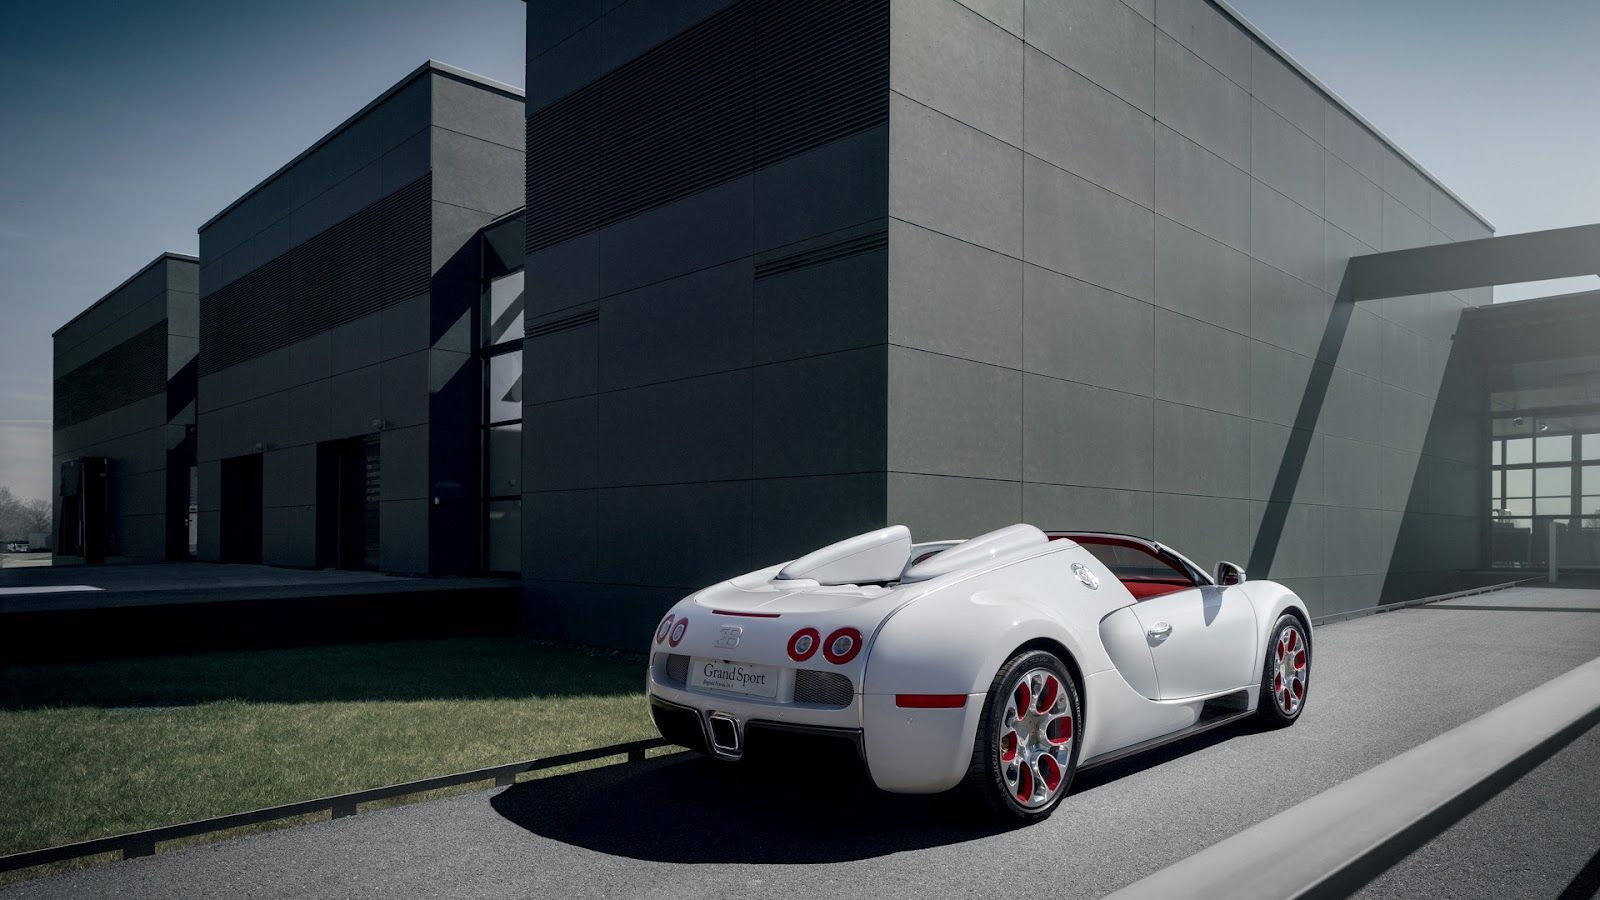 2012 bugatti veyron grand sport wei long 8 0 w16 quad turbo 987 hp 1 580 000. Black Bedroom Furniture Sets. Home Design Ideas